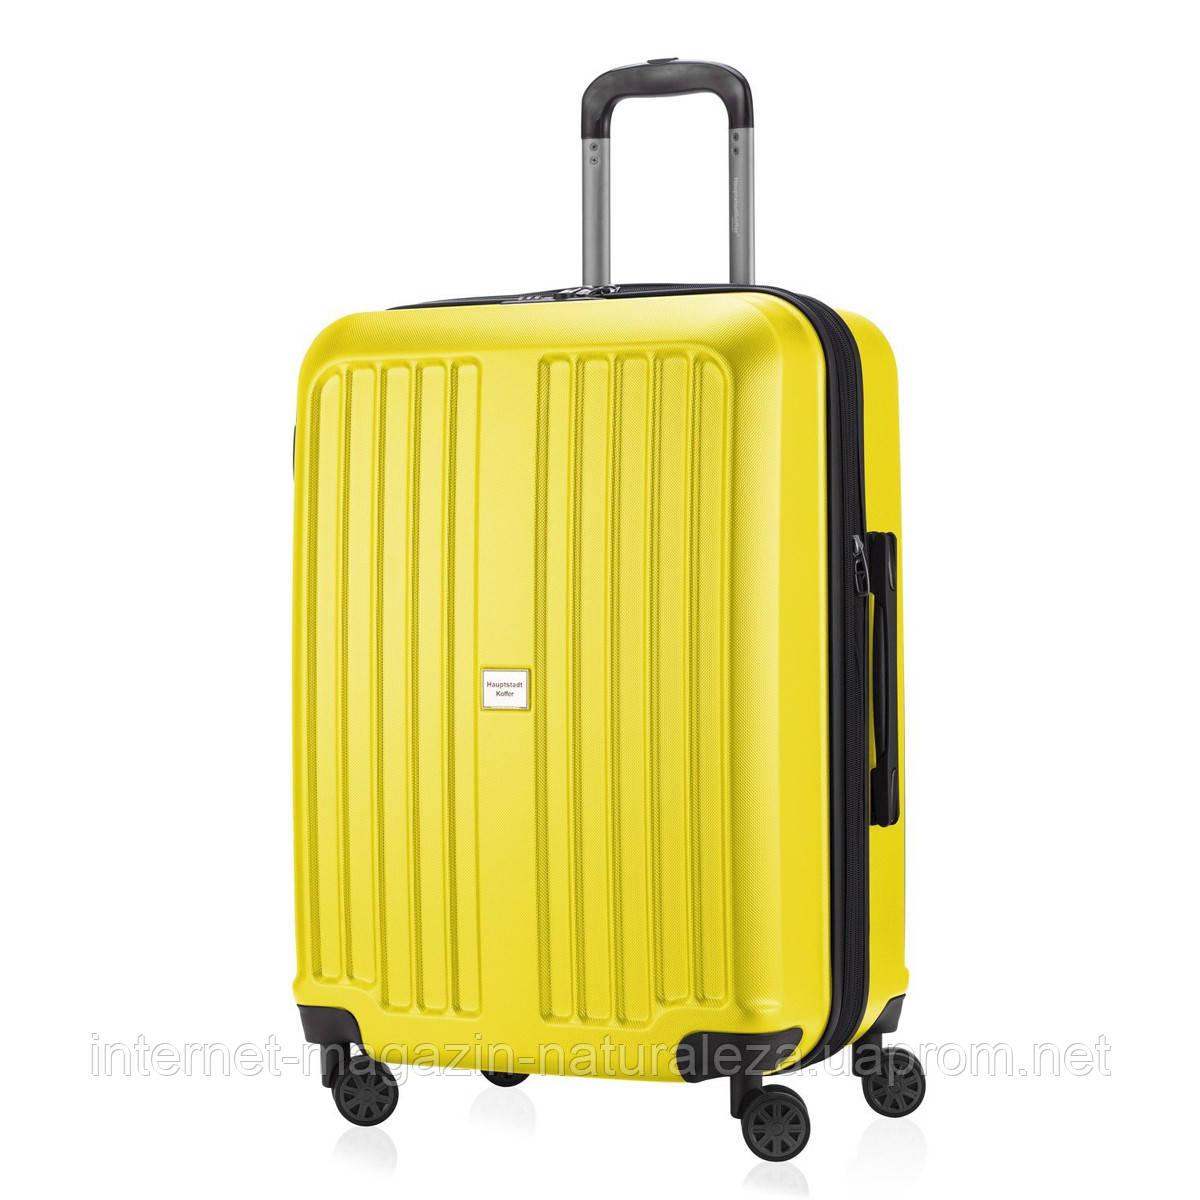 Чемоданы дорожные Hauptstadtkoffer Xberg maxi желтый матовый